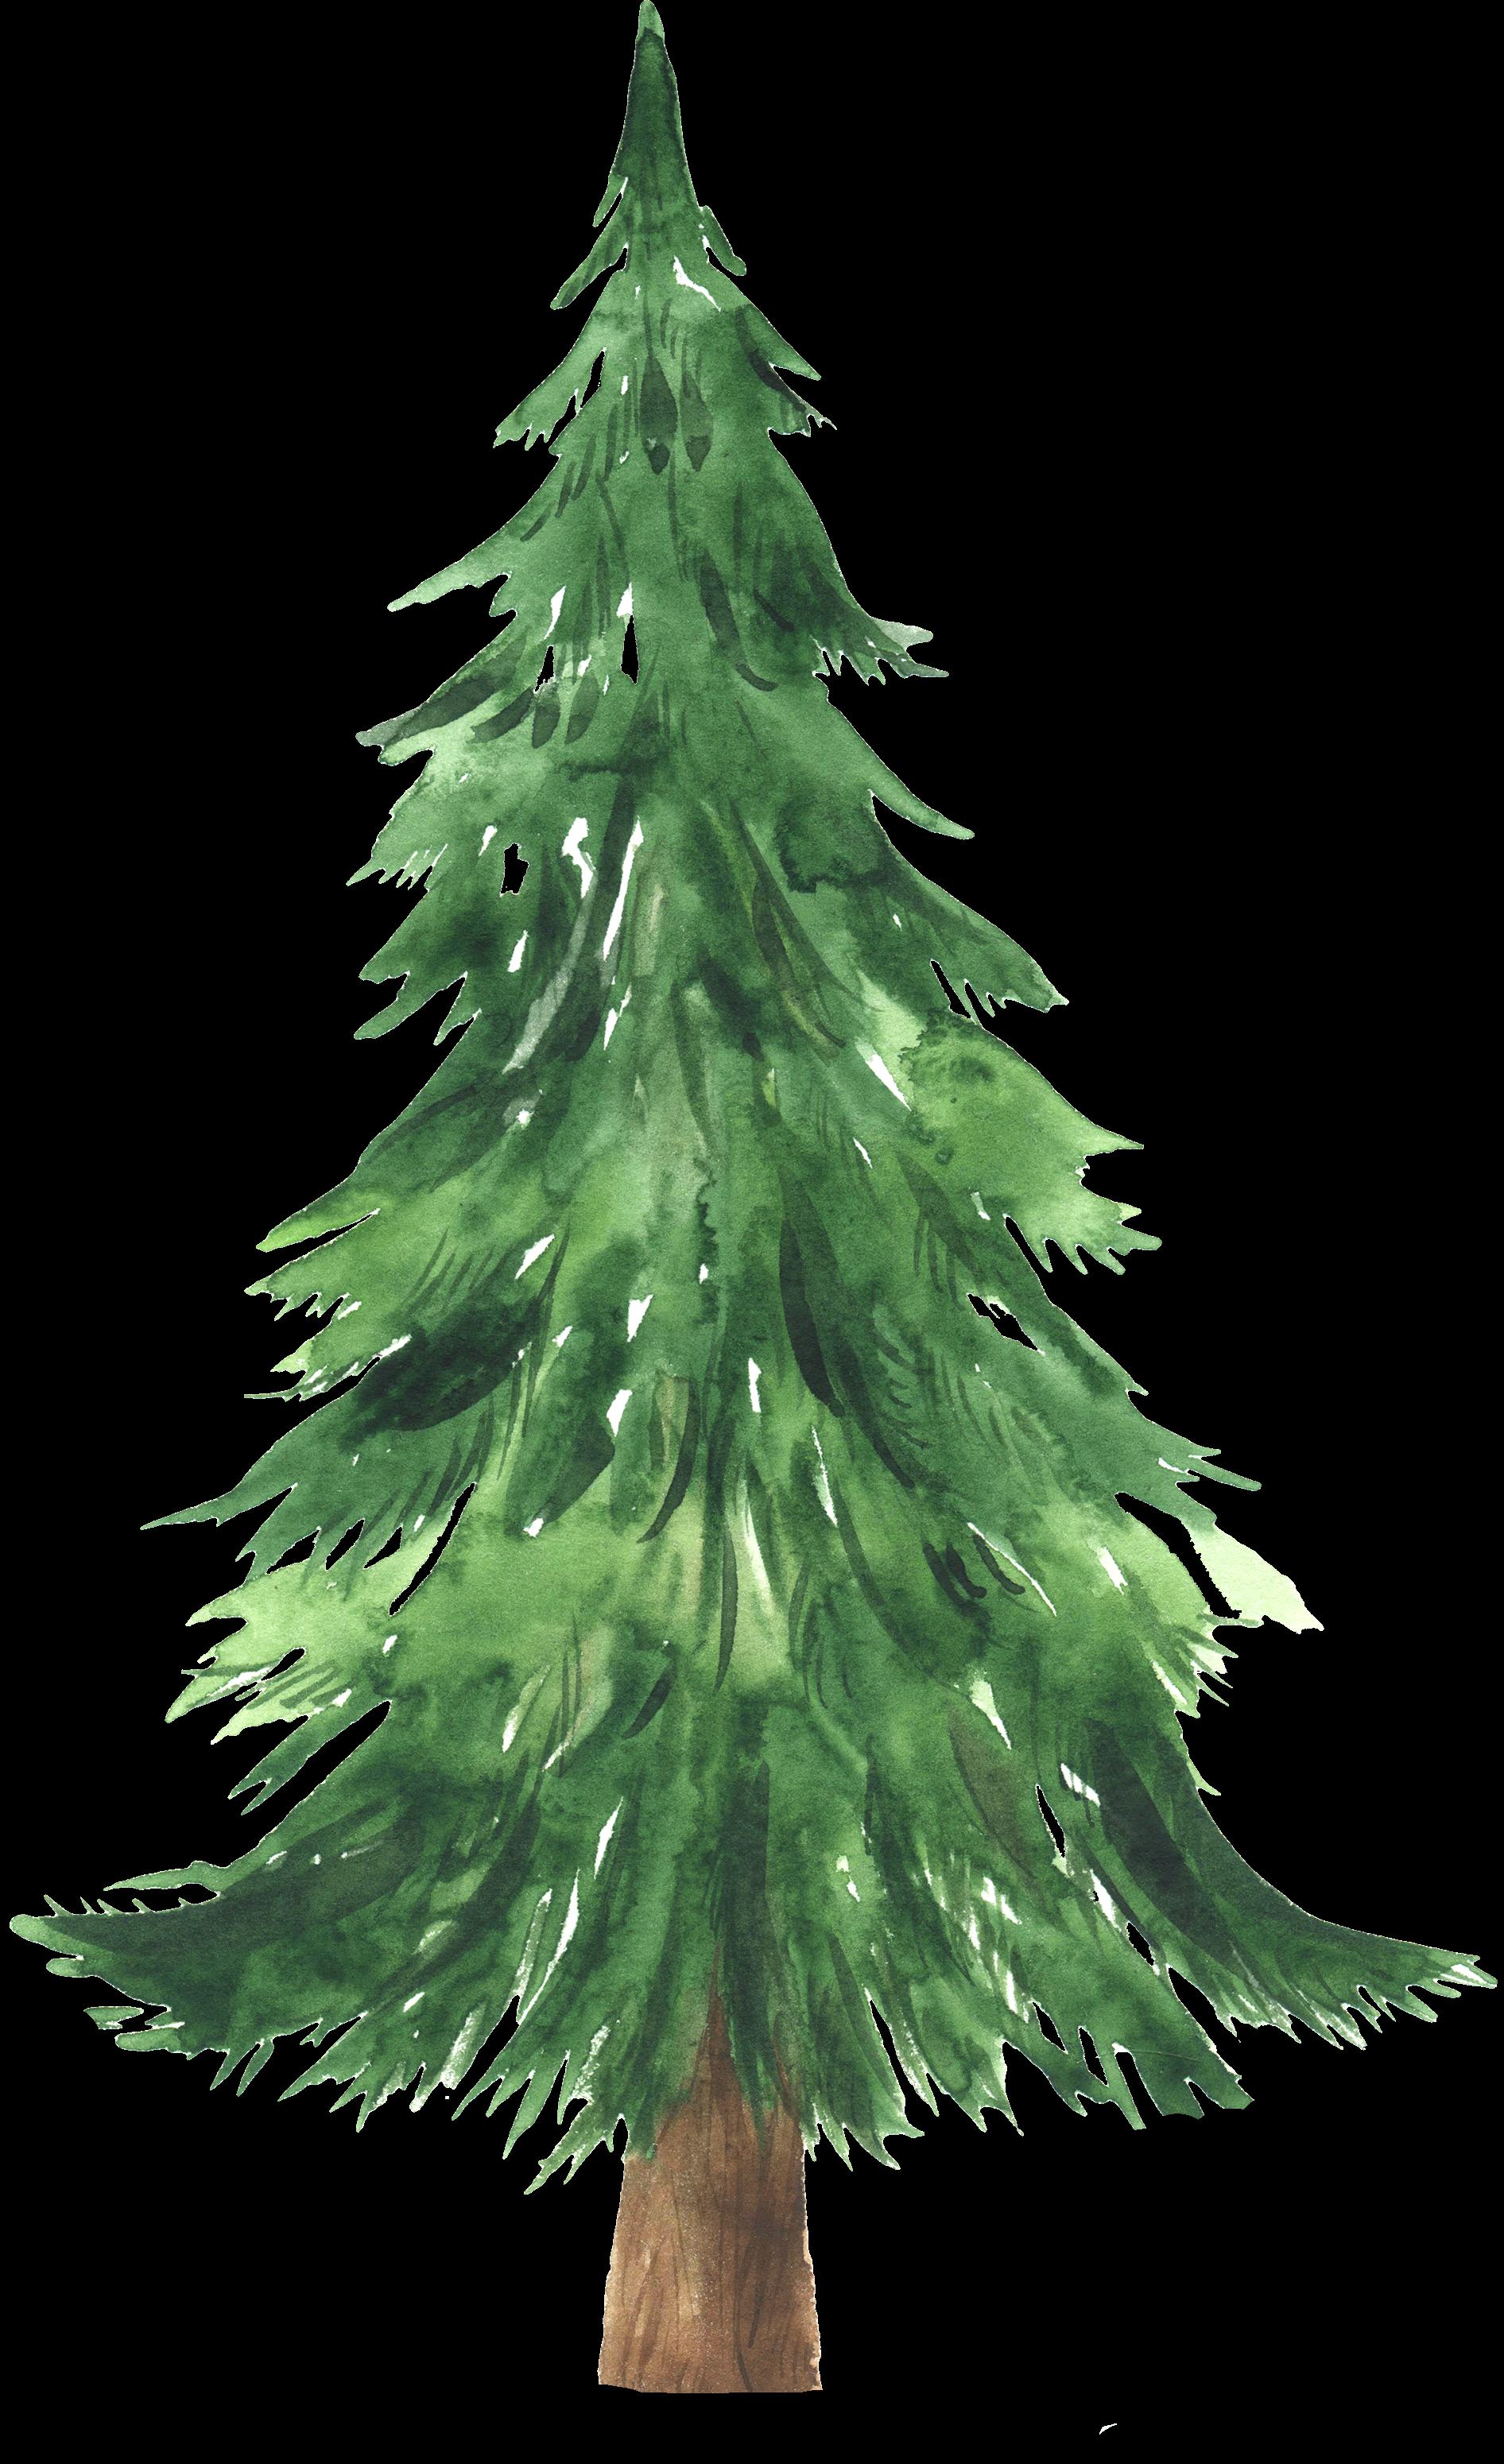 Among the Evergreens